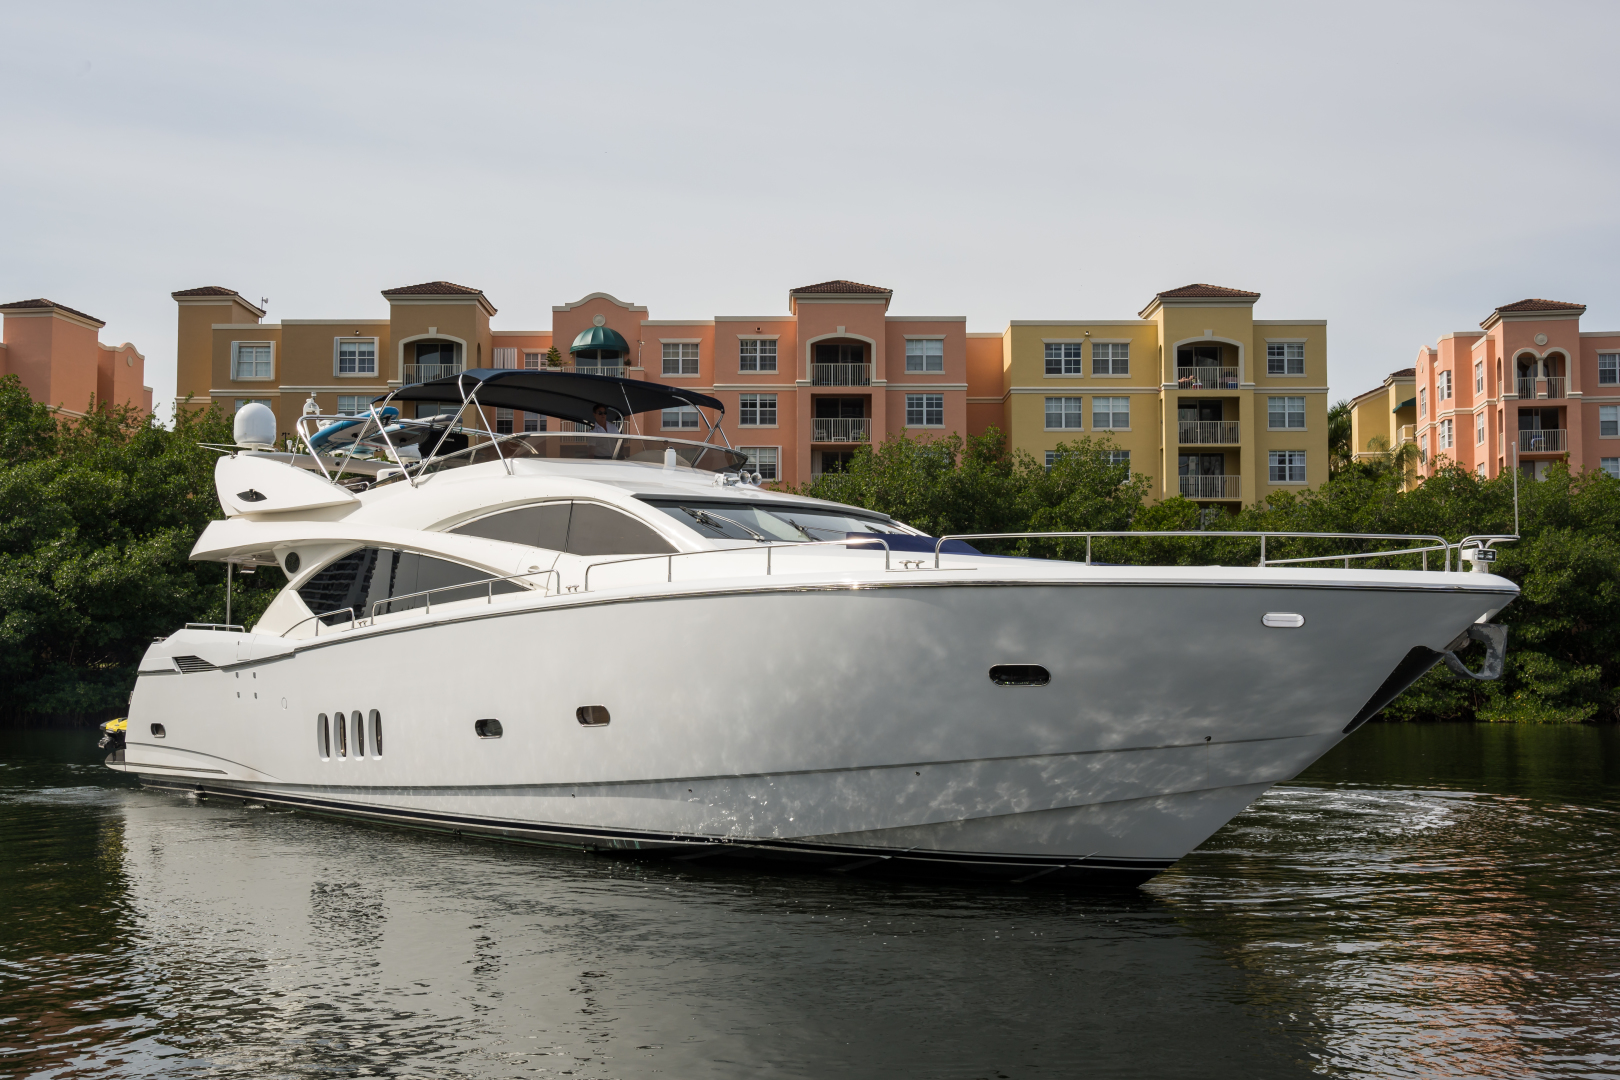 Sunseeker-Yacht 2004-TOP GUN Aventura-Florida-United States-1450700 | Thumbnail